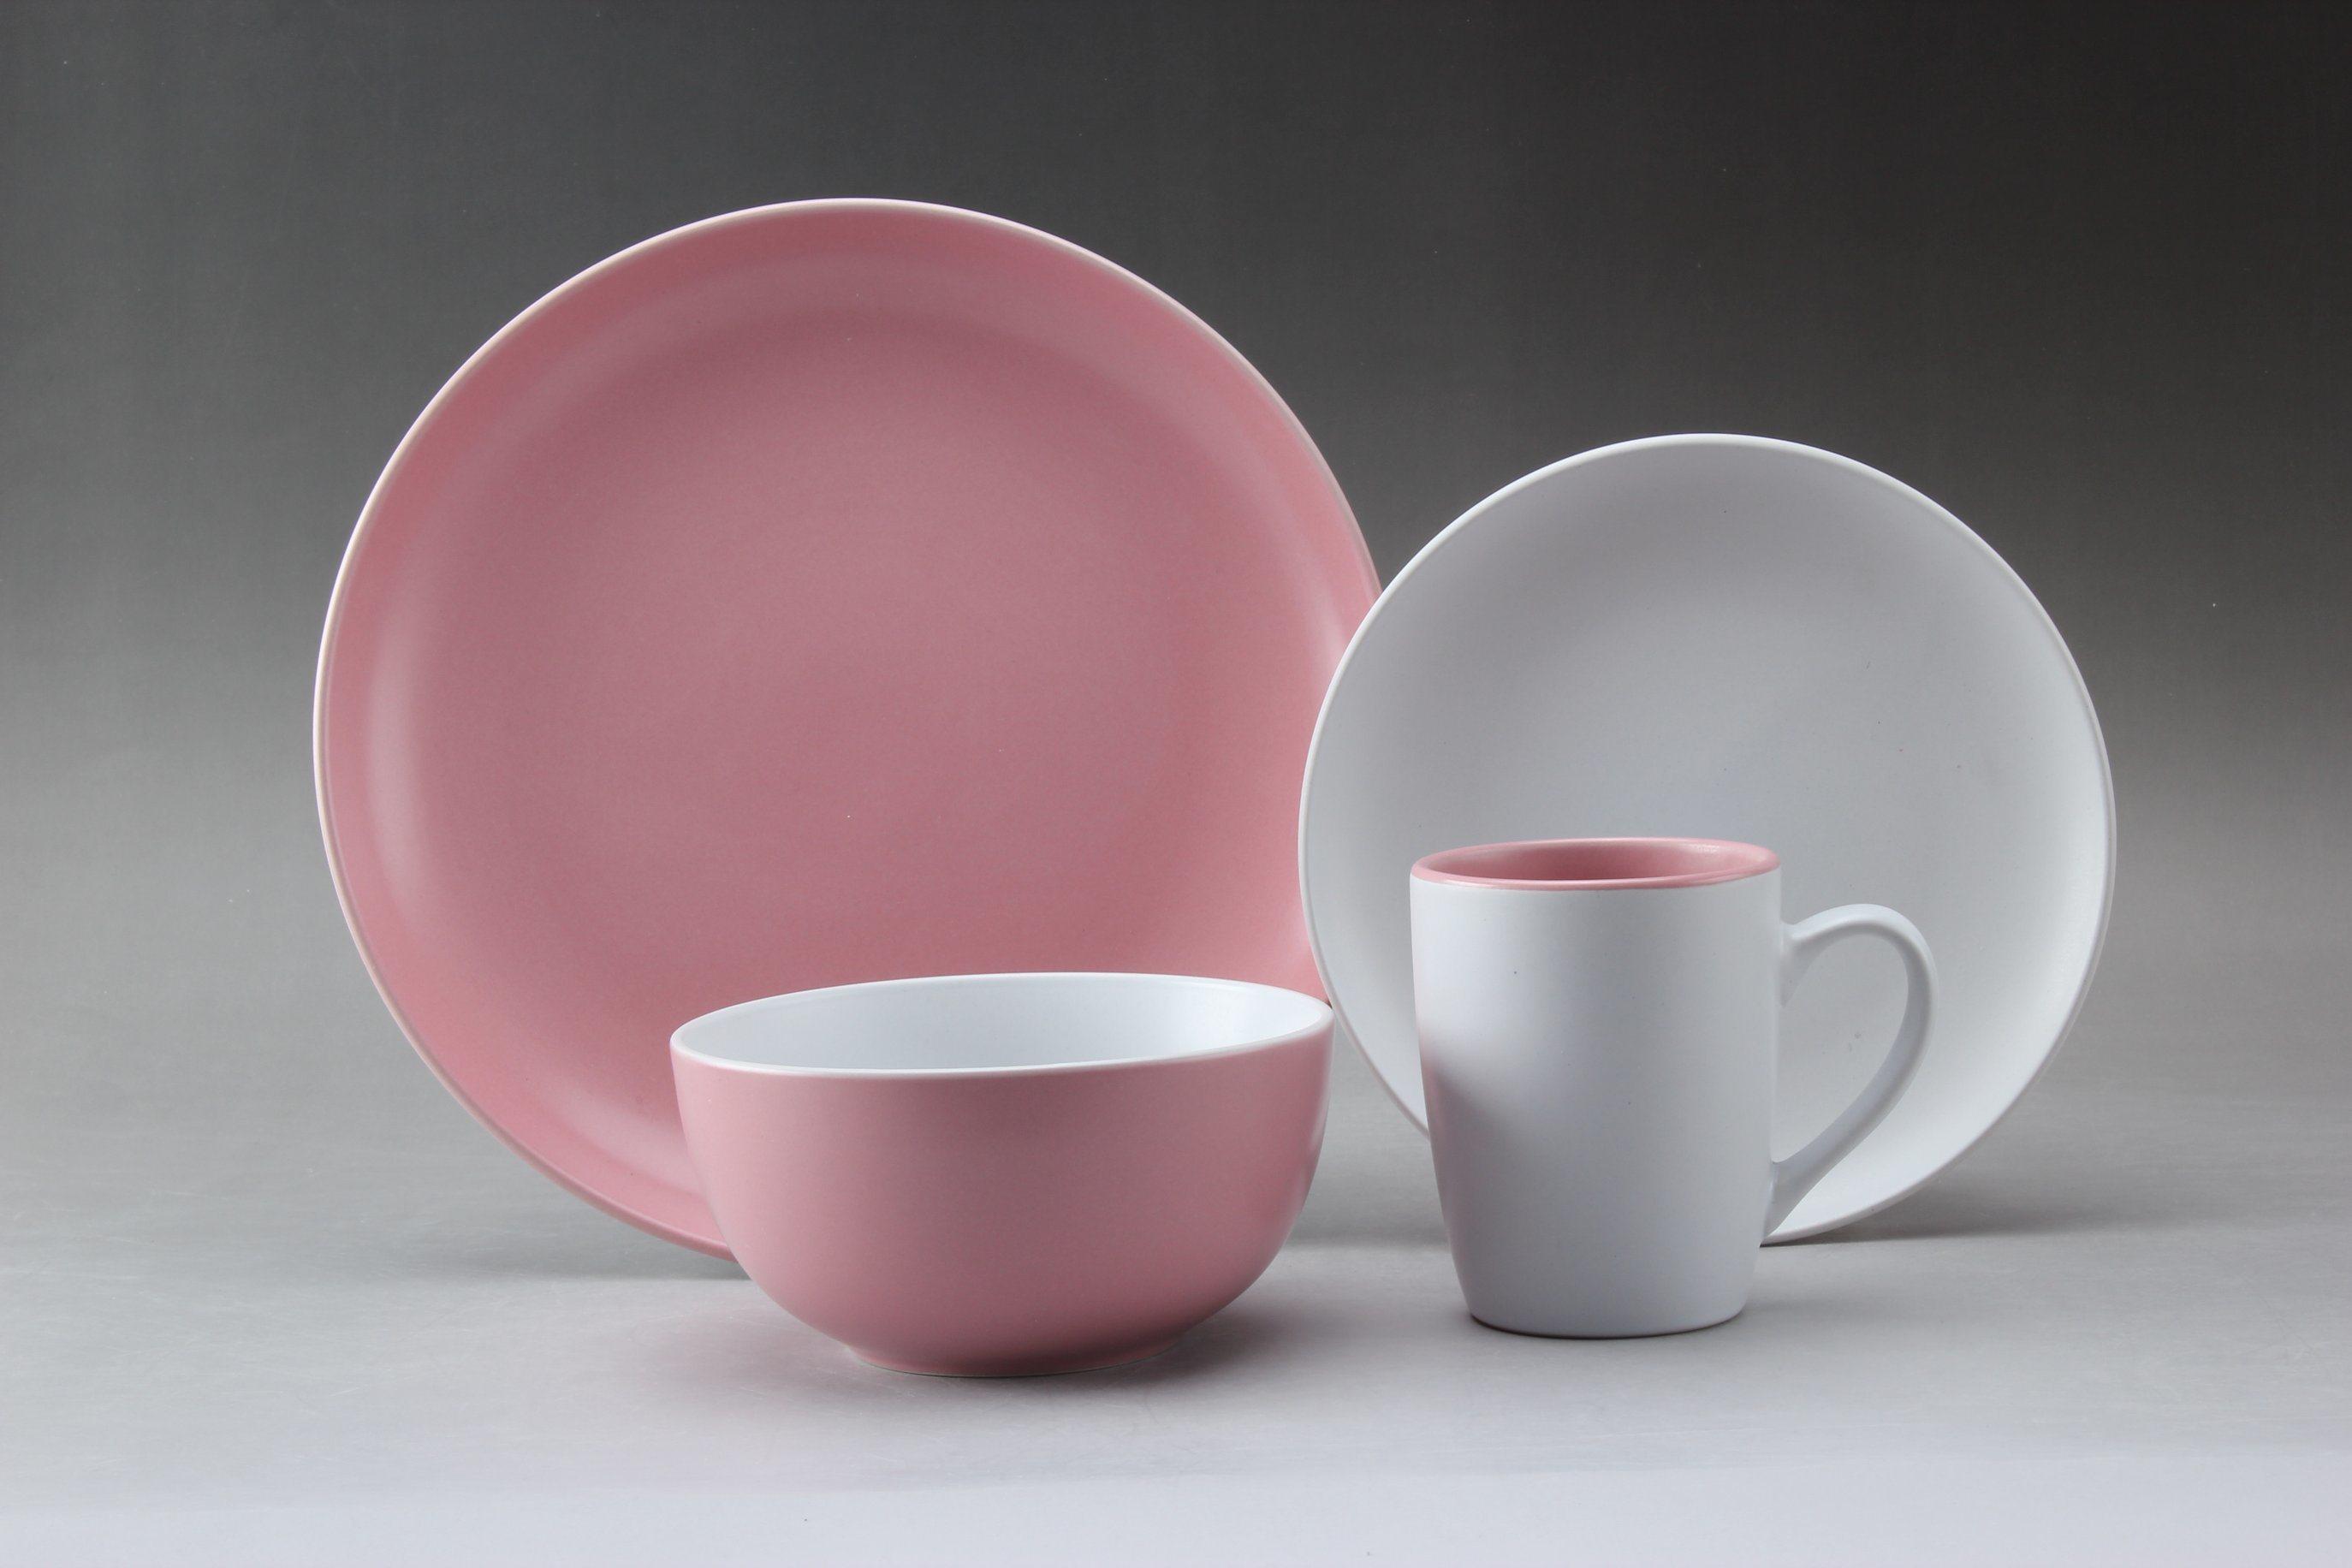 china 16pcs stoneware dinner set pink